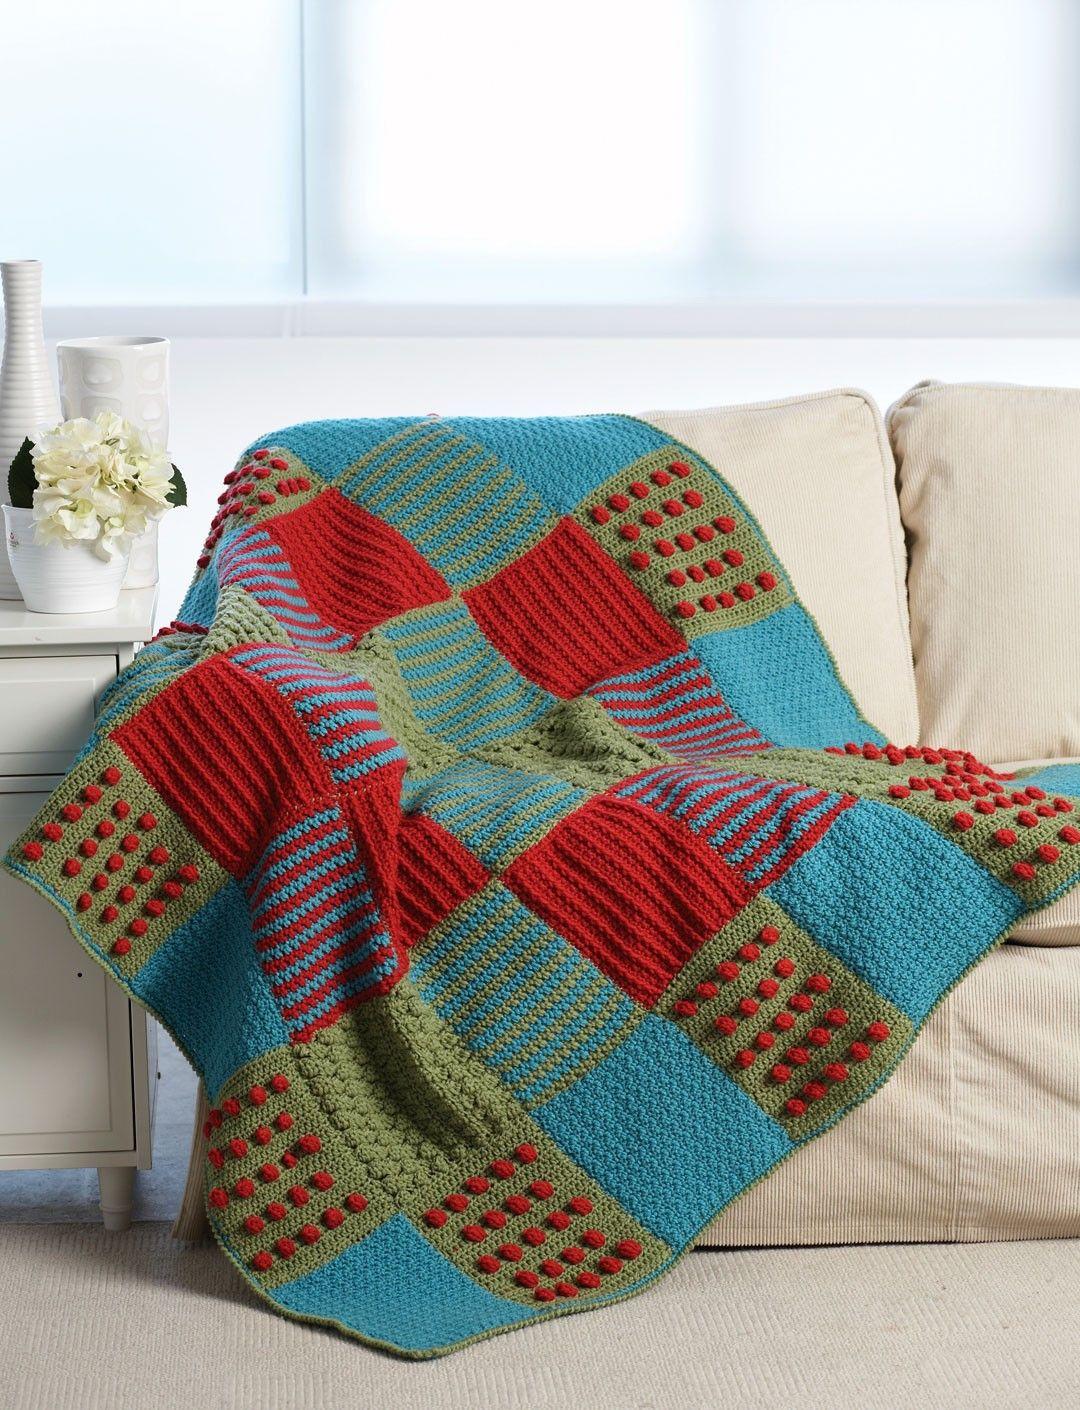 Yarnspirations bernat textured crochet blocks afghan explore afghan crochet patterns crochet blocks and more bankloansurffo Images